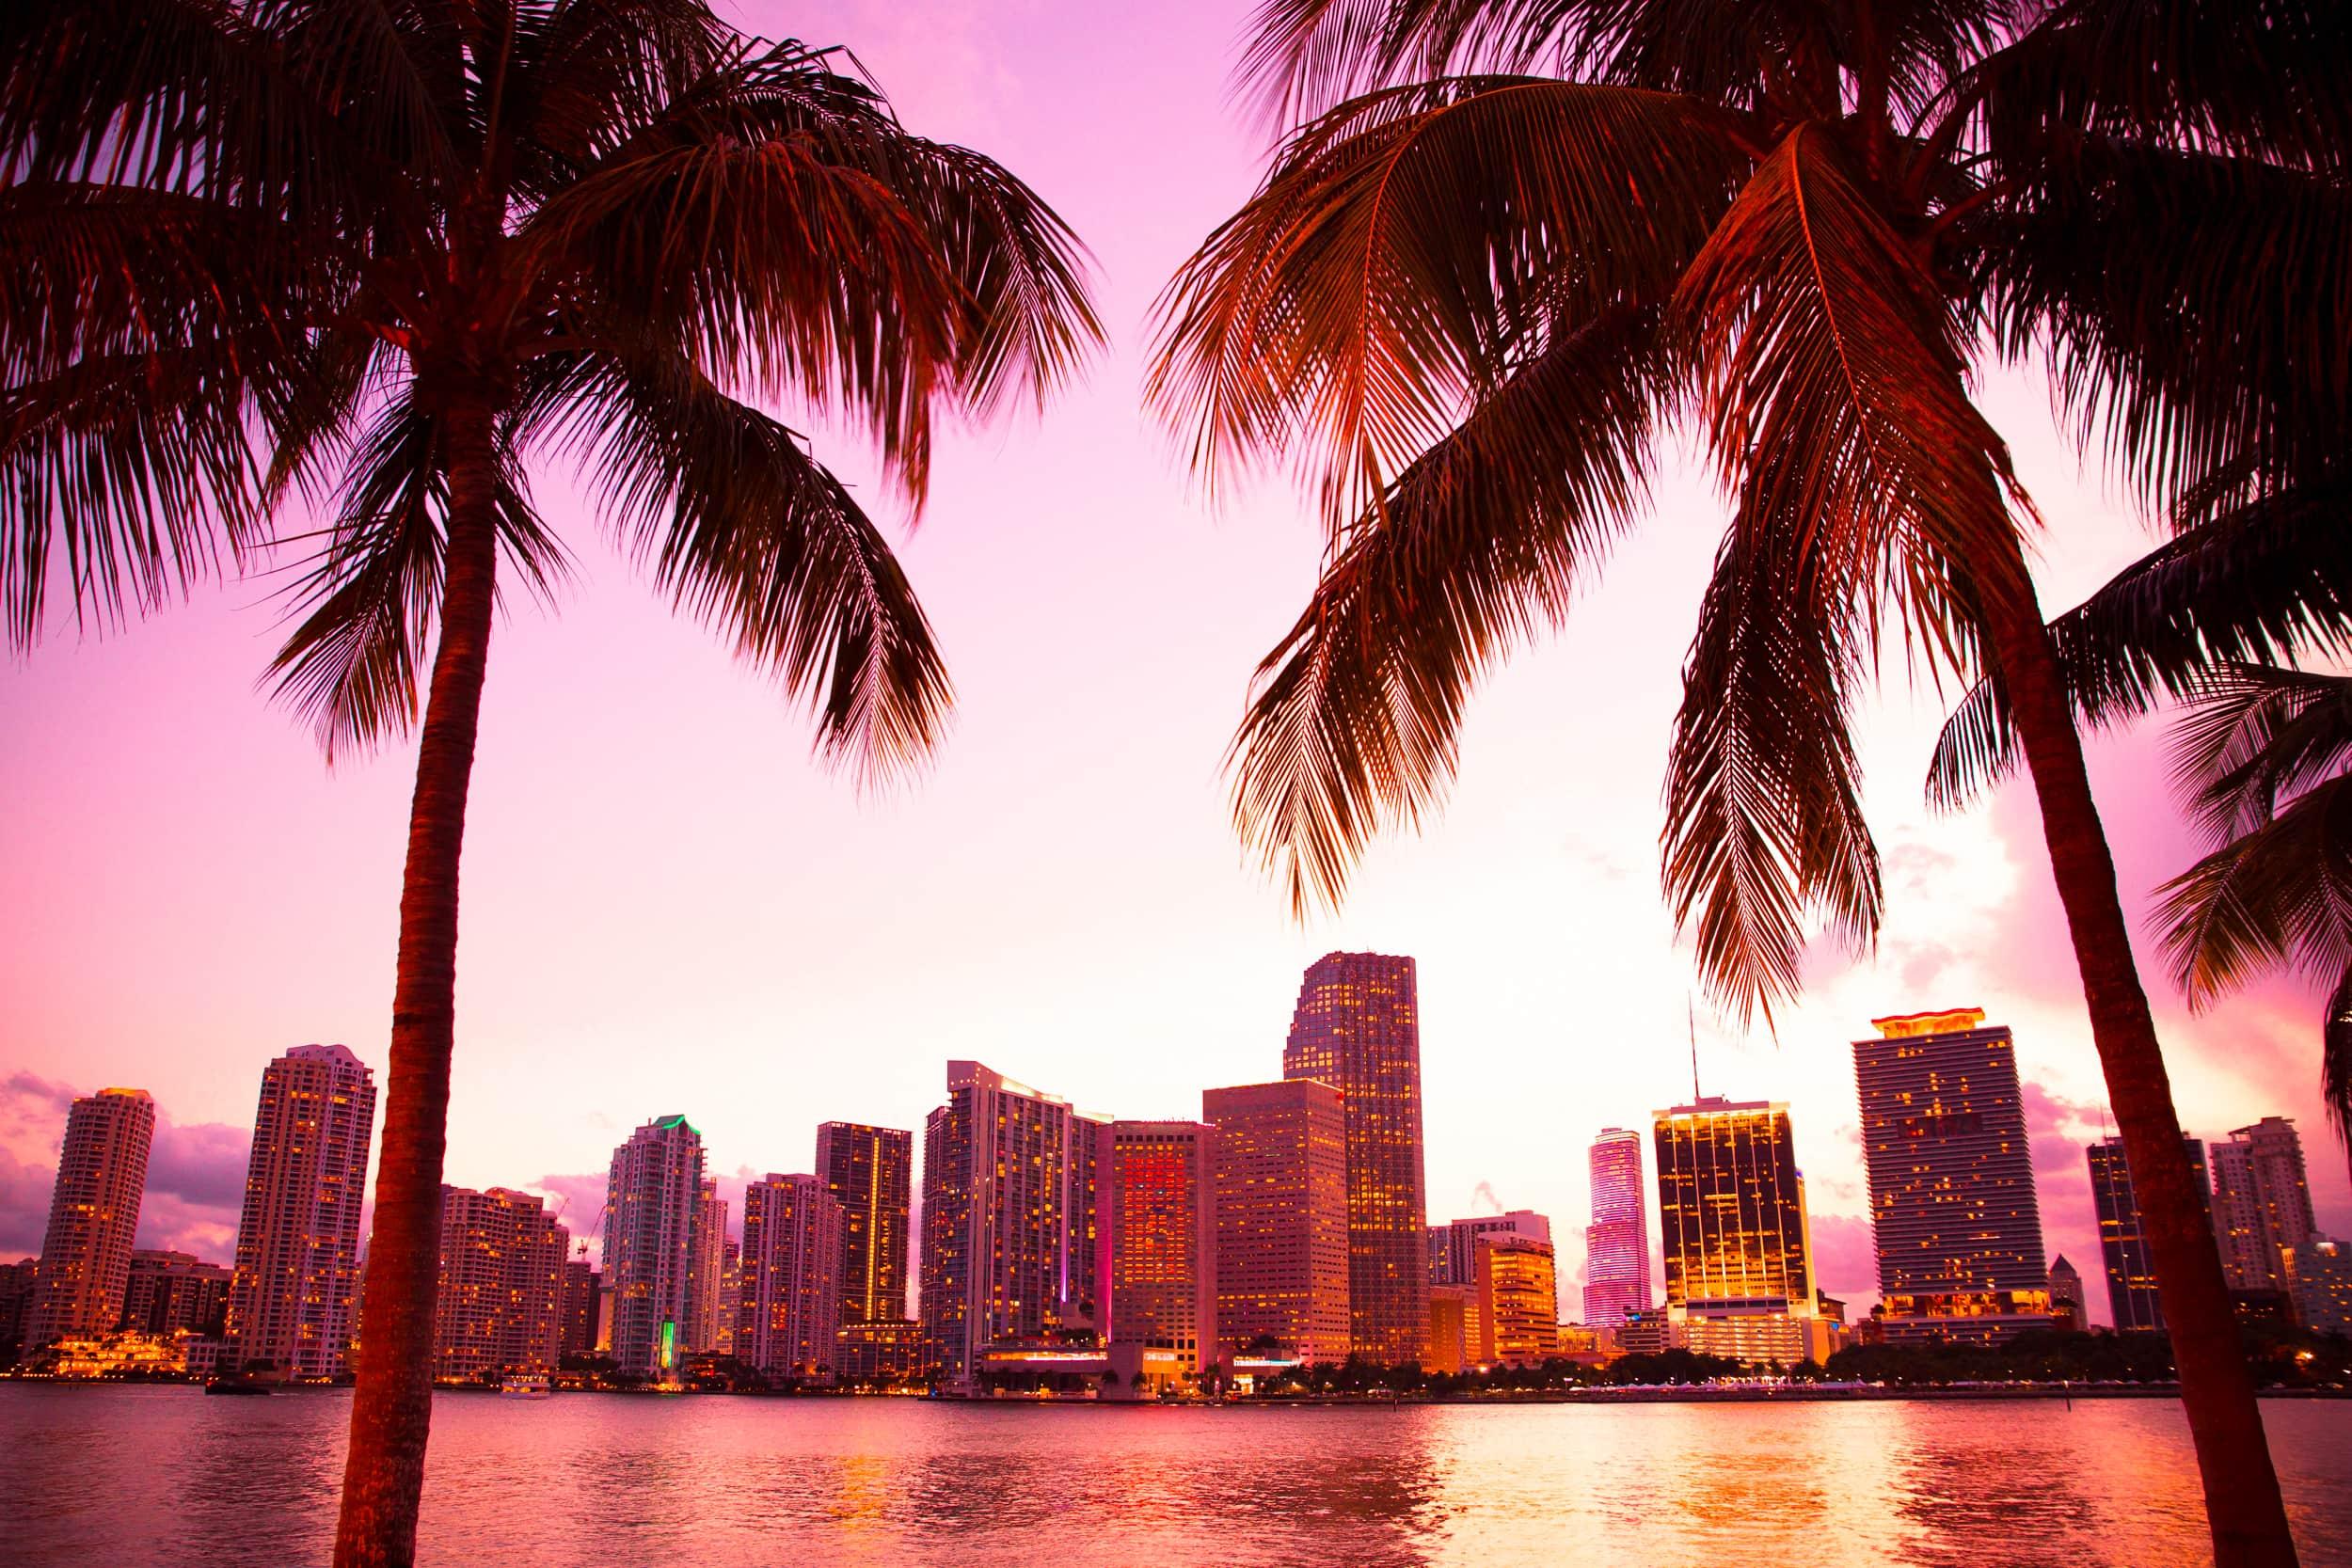 MiamiCoin: Bürgermeister Suarez drückt weiter aufs Krypto-Gaspedal